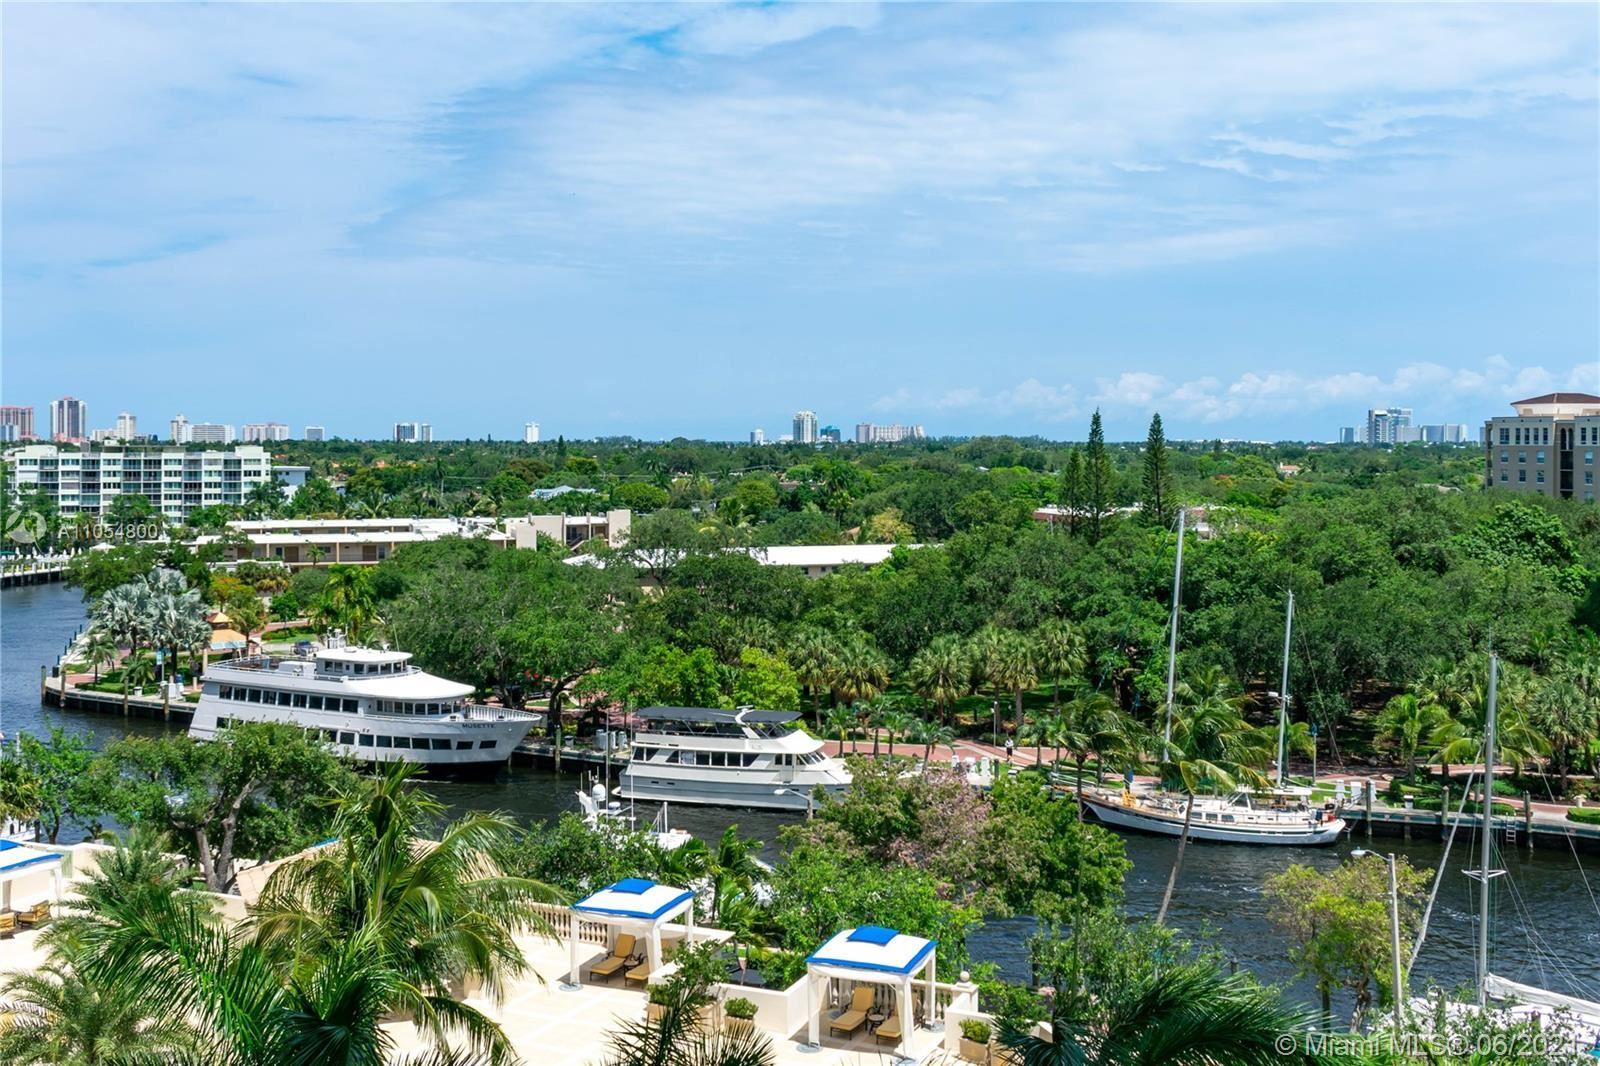 347 N New River Dr E #802, Fort Lauderdale, FL 33301 - #: A11054800